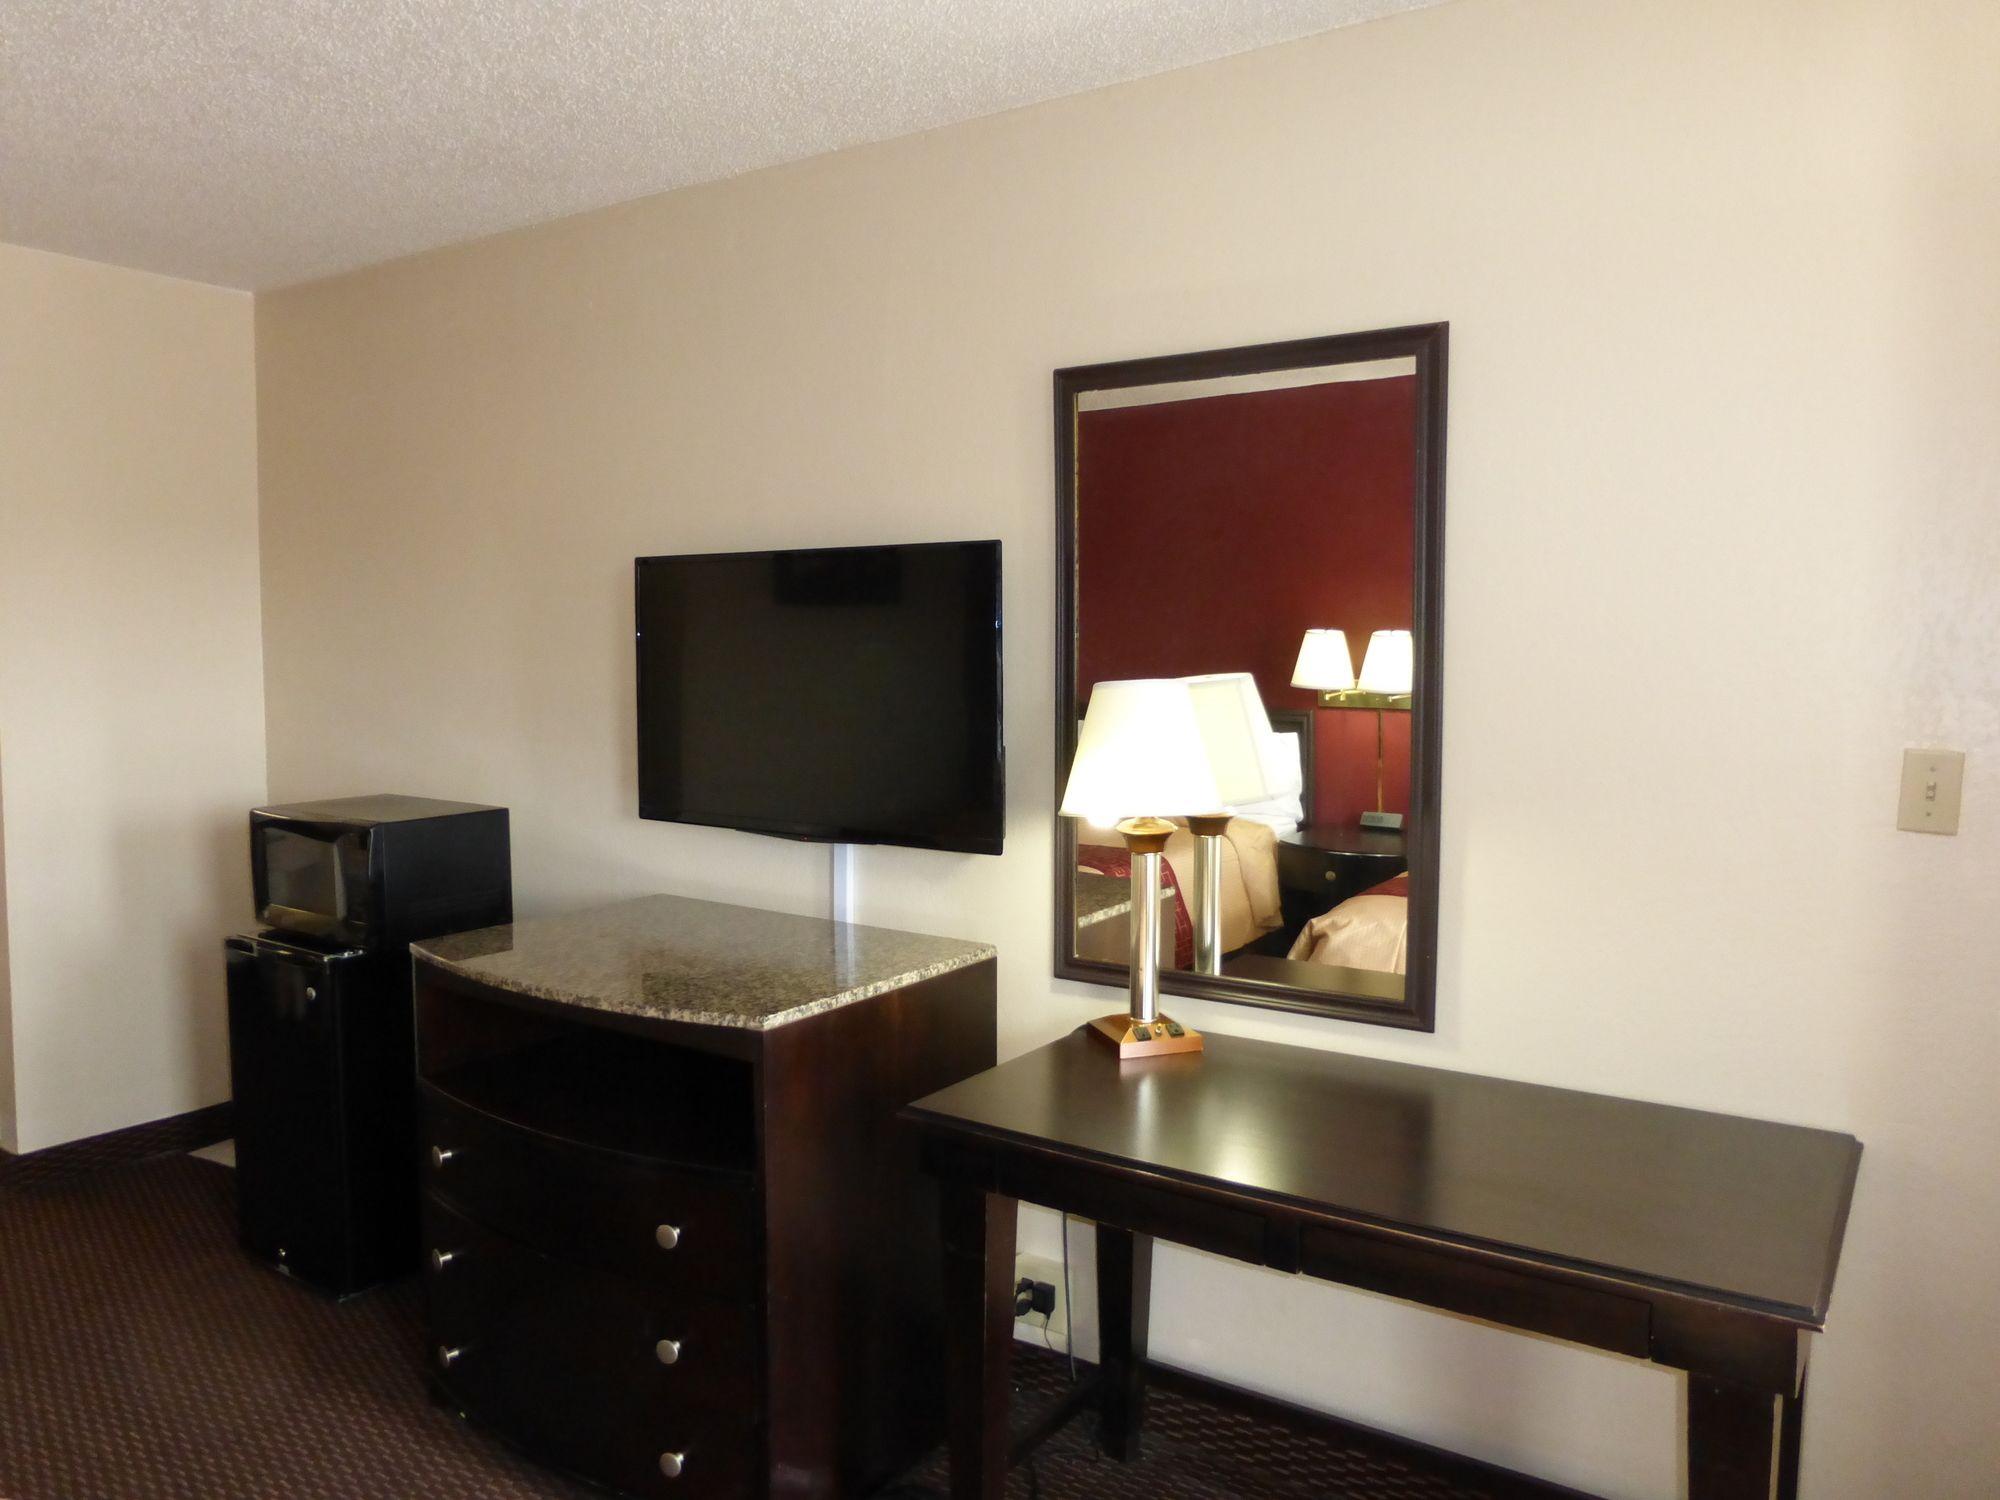 Americas Best Value Inn in Abingdon, VA